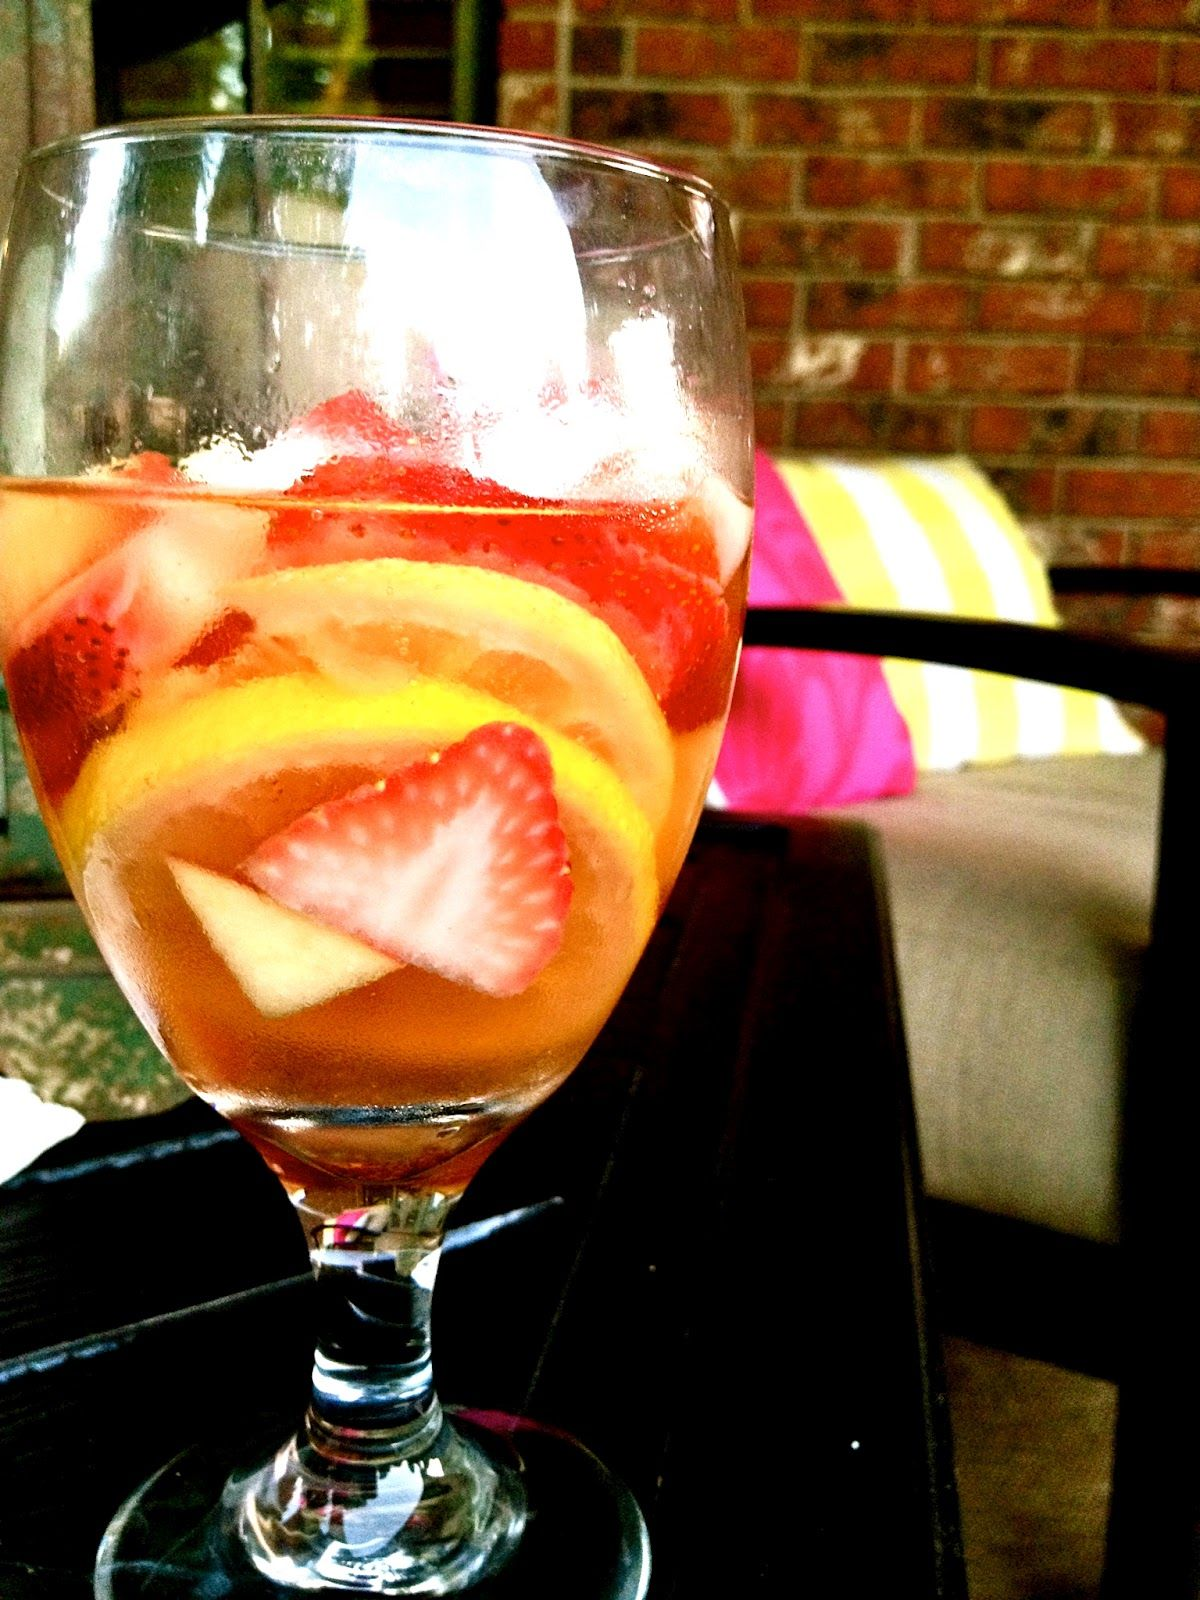 My Favorite Sangria- White Strawberry-Lemon Sangria